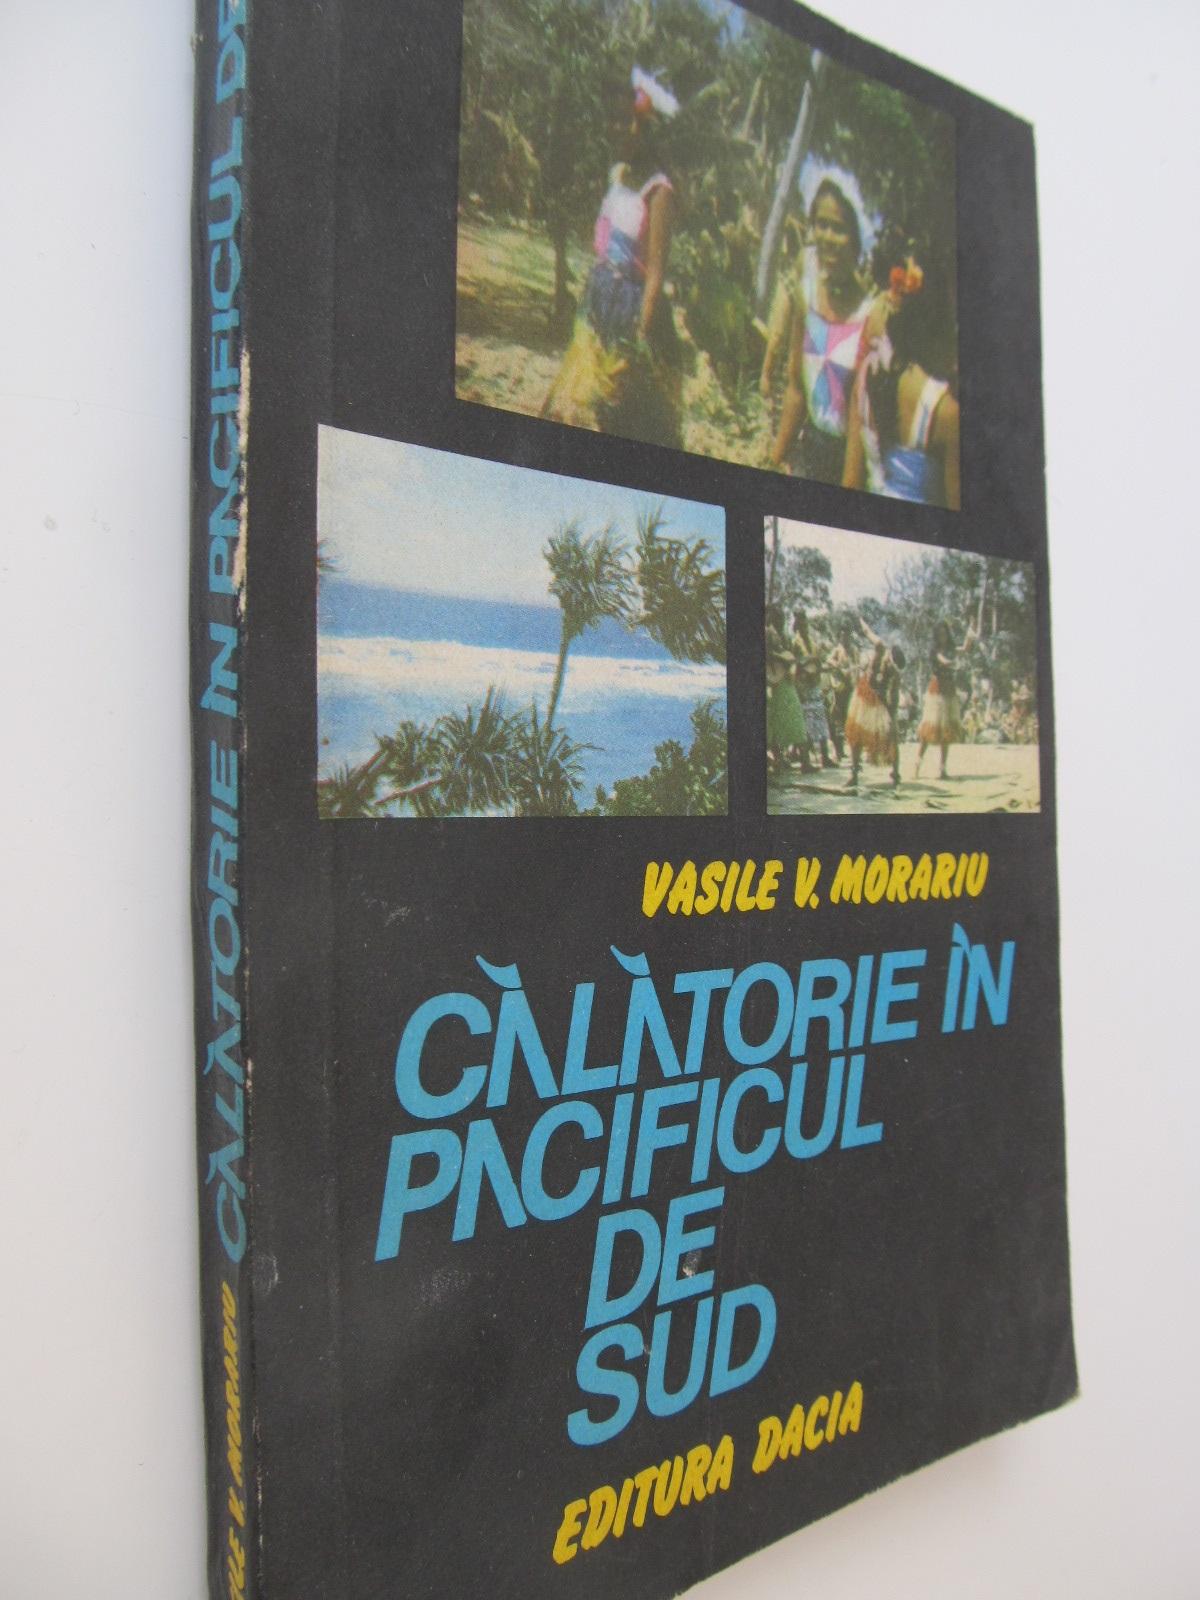 Calatorie in Pacificul de sud - Vasile V. Morariu | Detalii carte